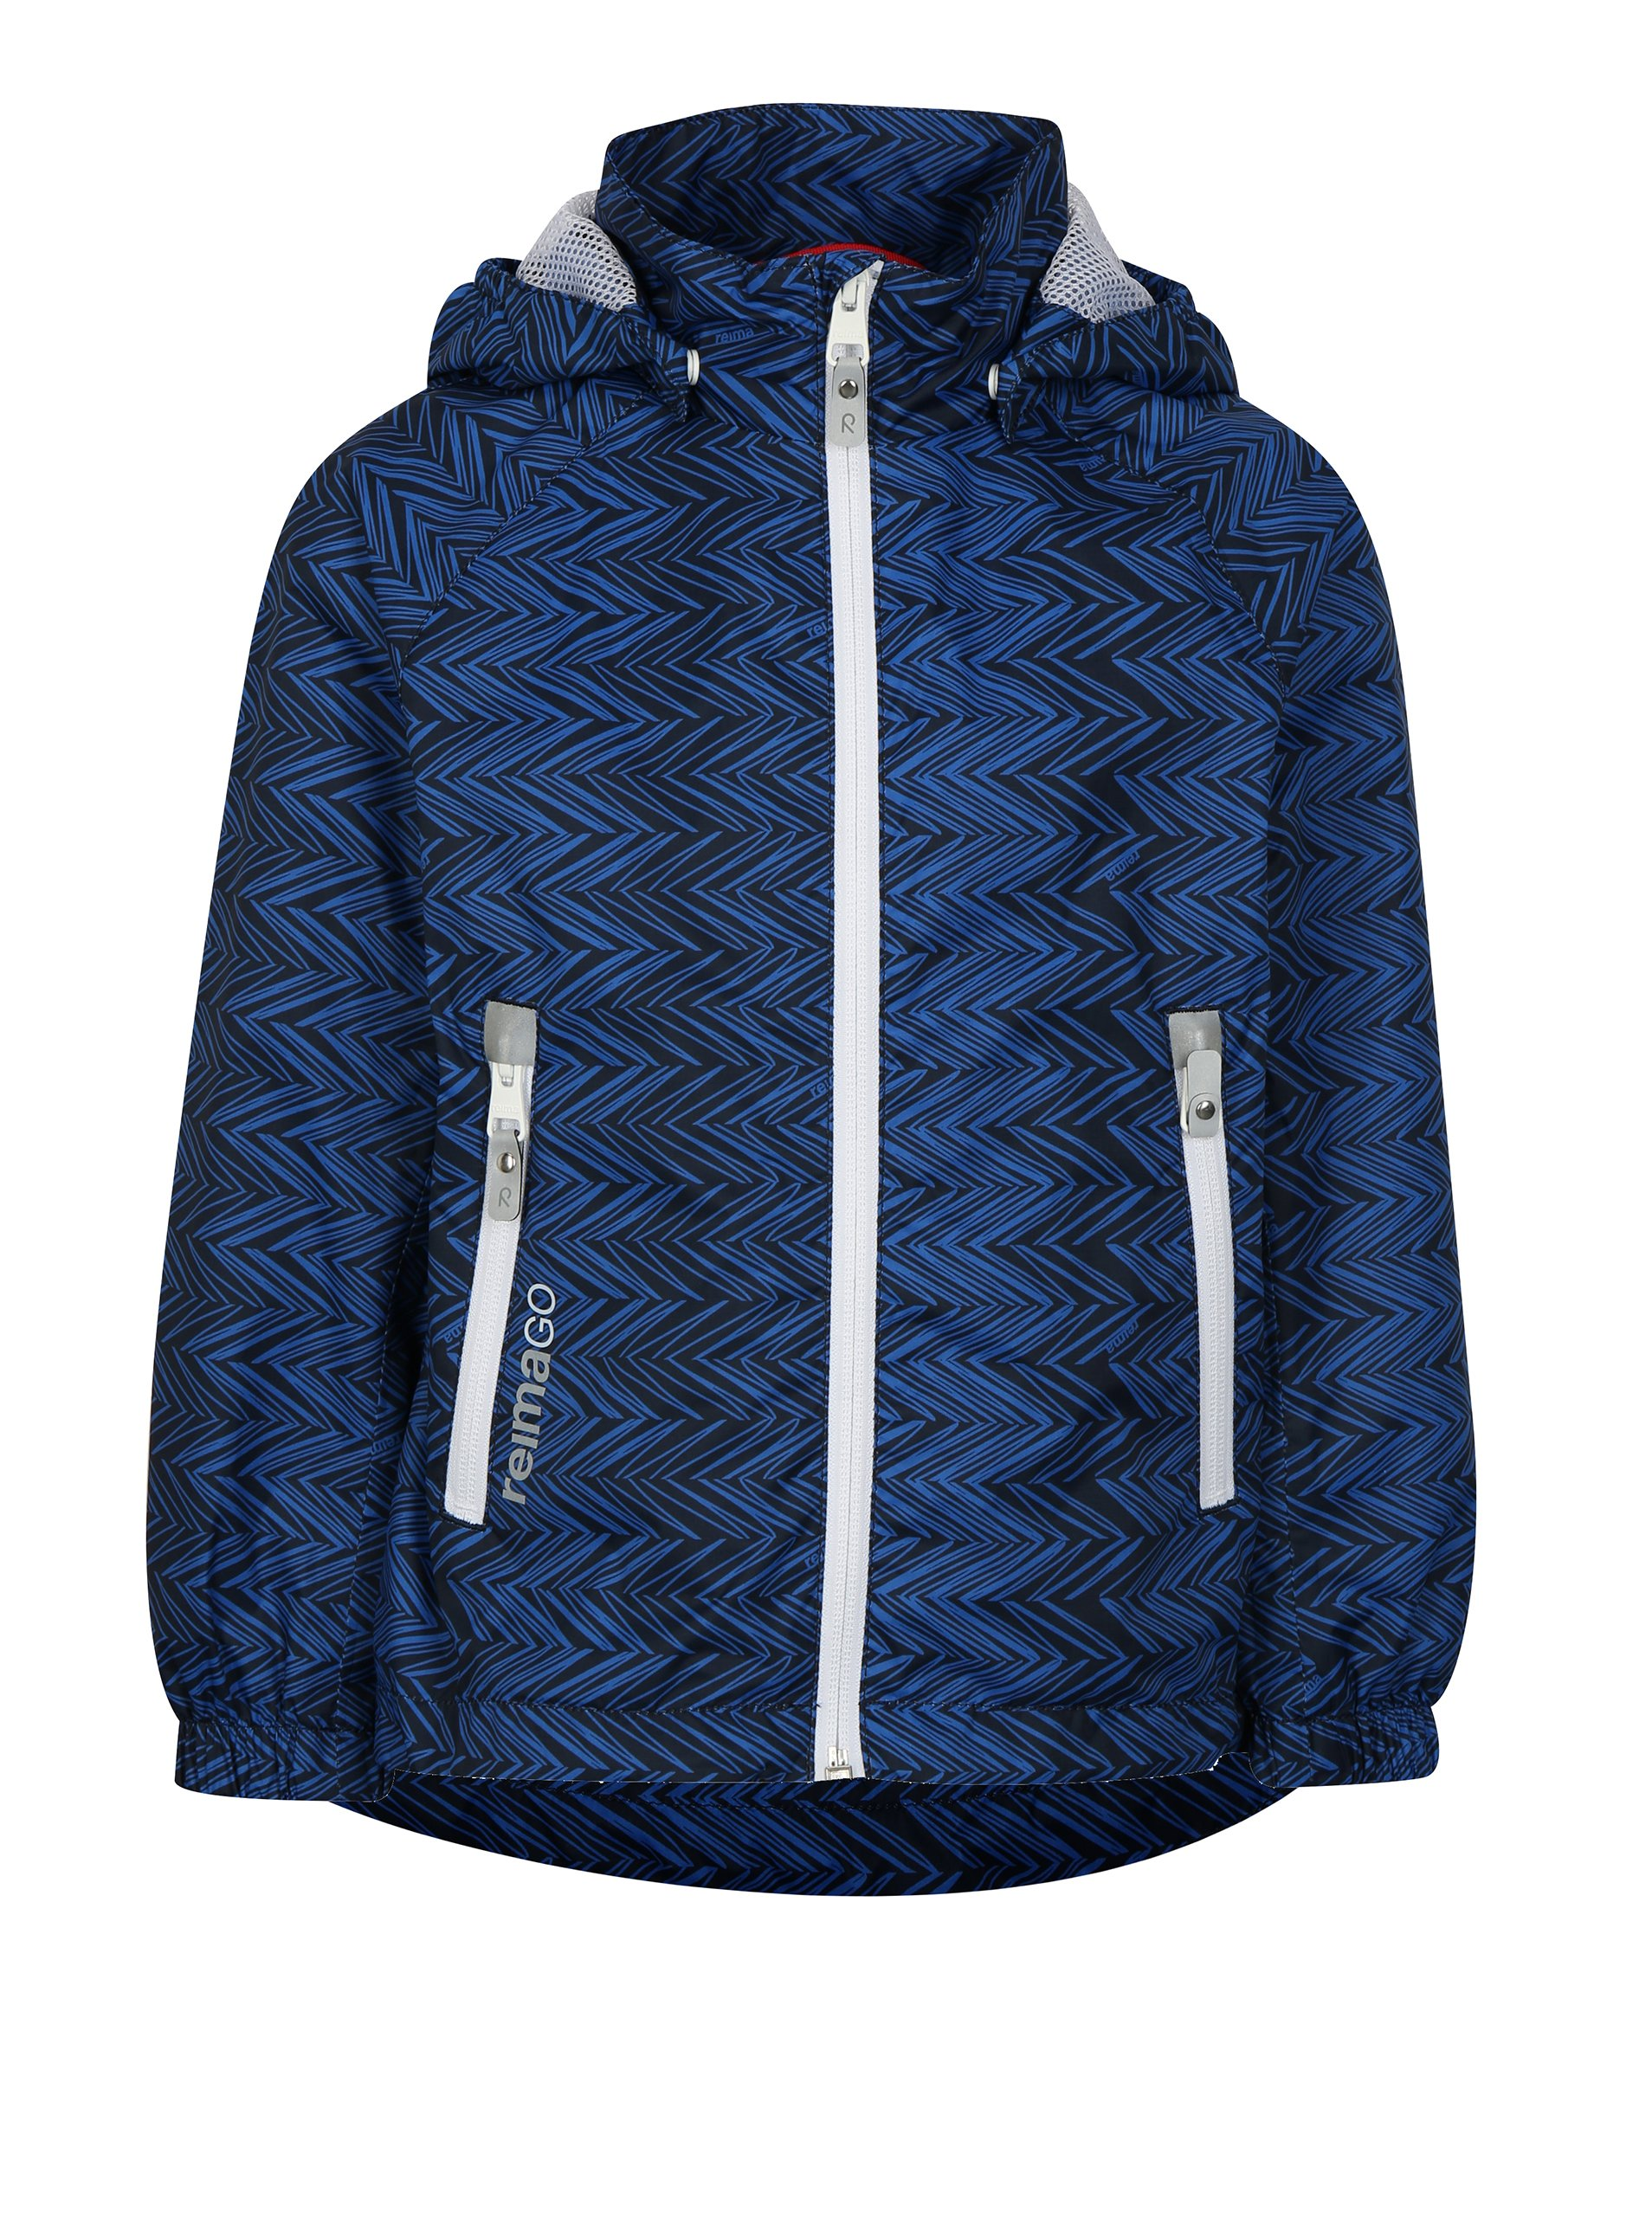 1ccc6a83324d2 Čierno–modrá chlapčenská funkčná bunda s kapucňou Reima Zigzag | Moda.sk